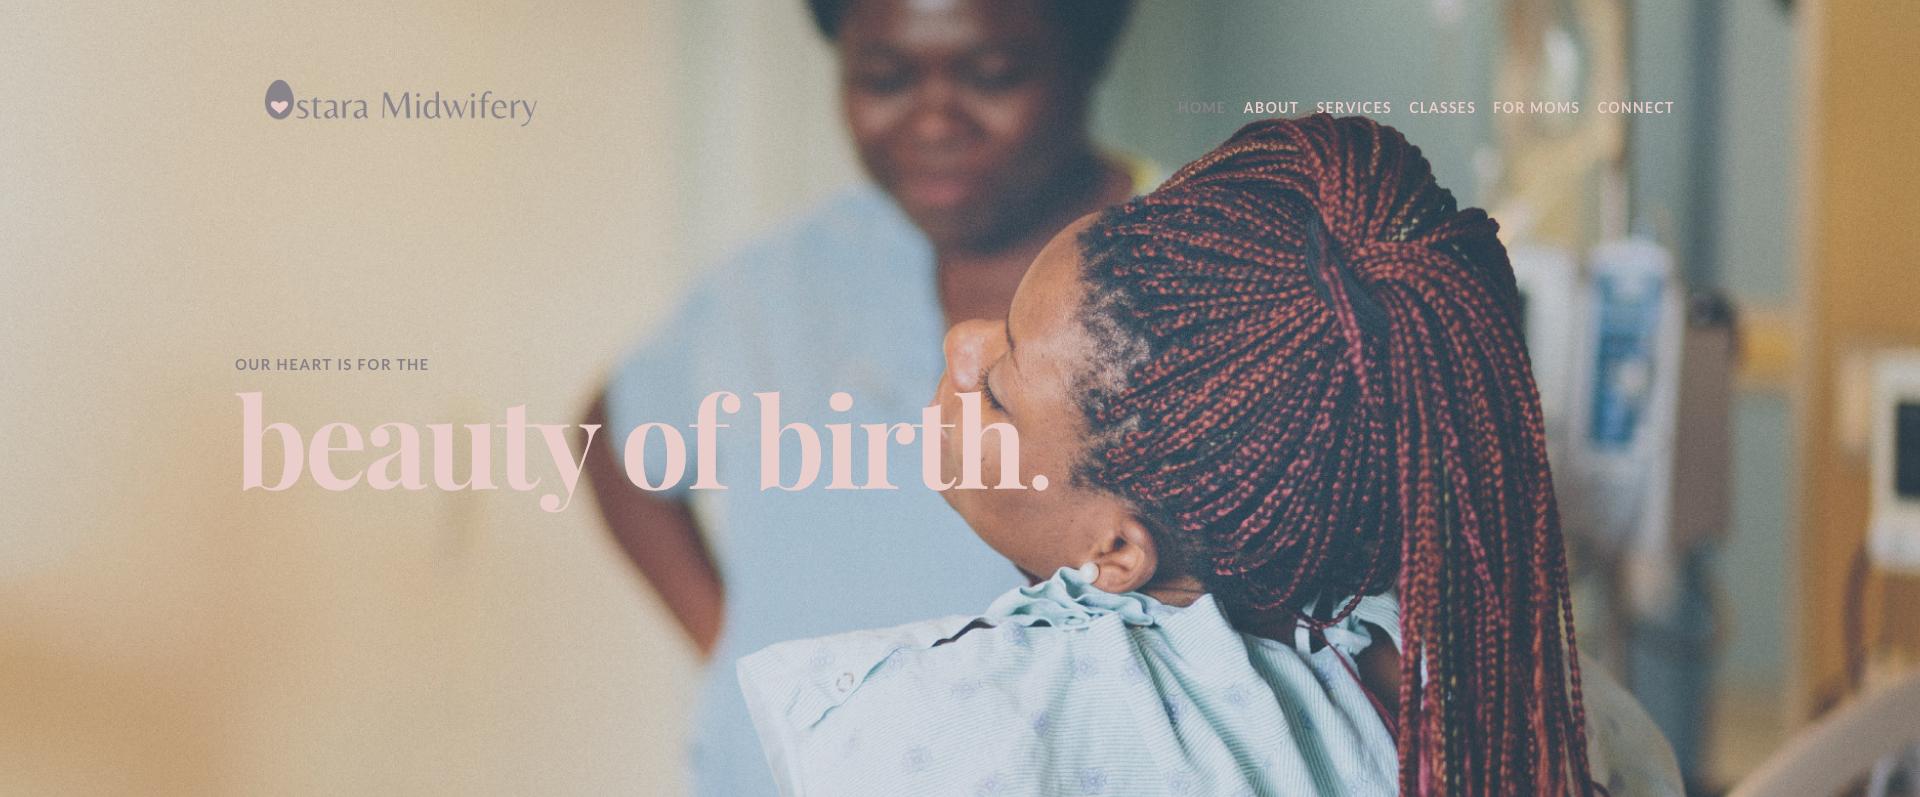 Ostara Midwifery